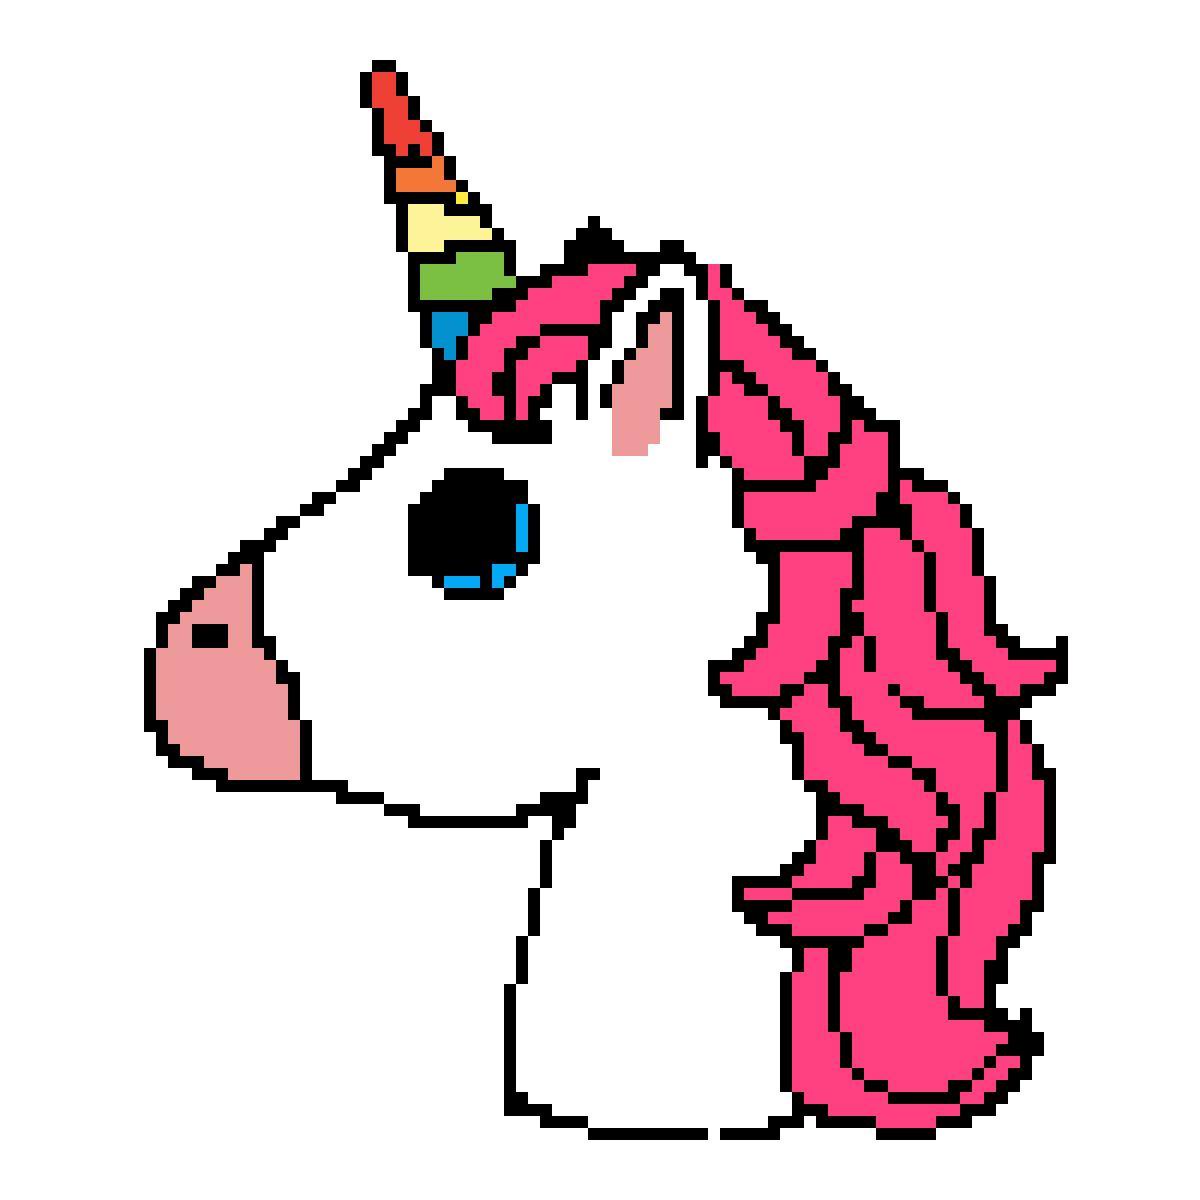 unicorn by PGhorselady